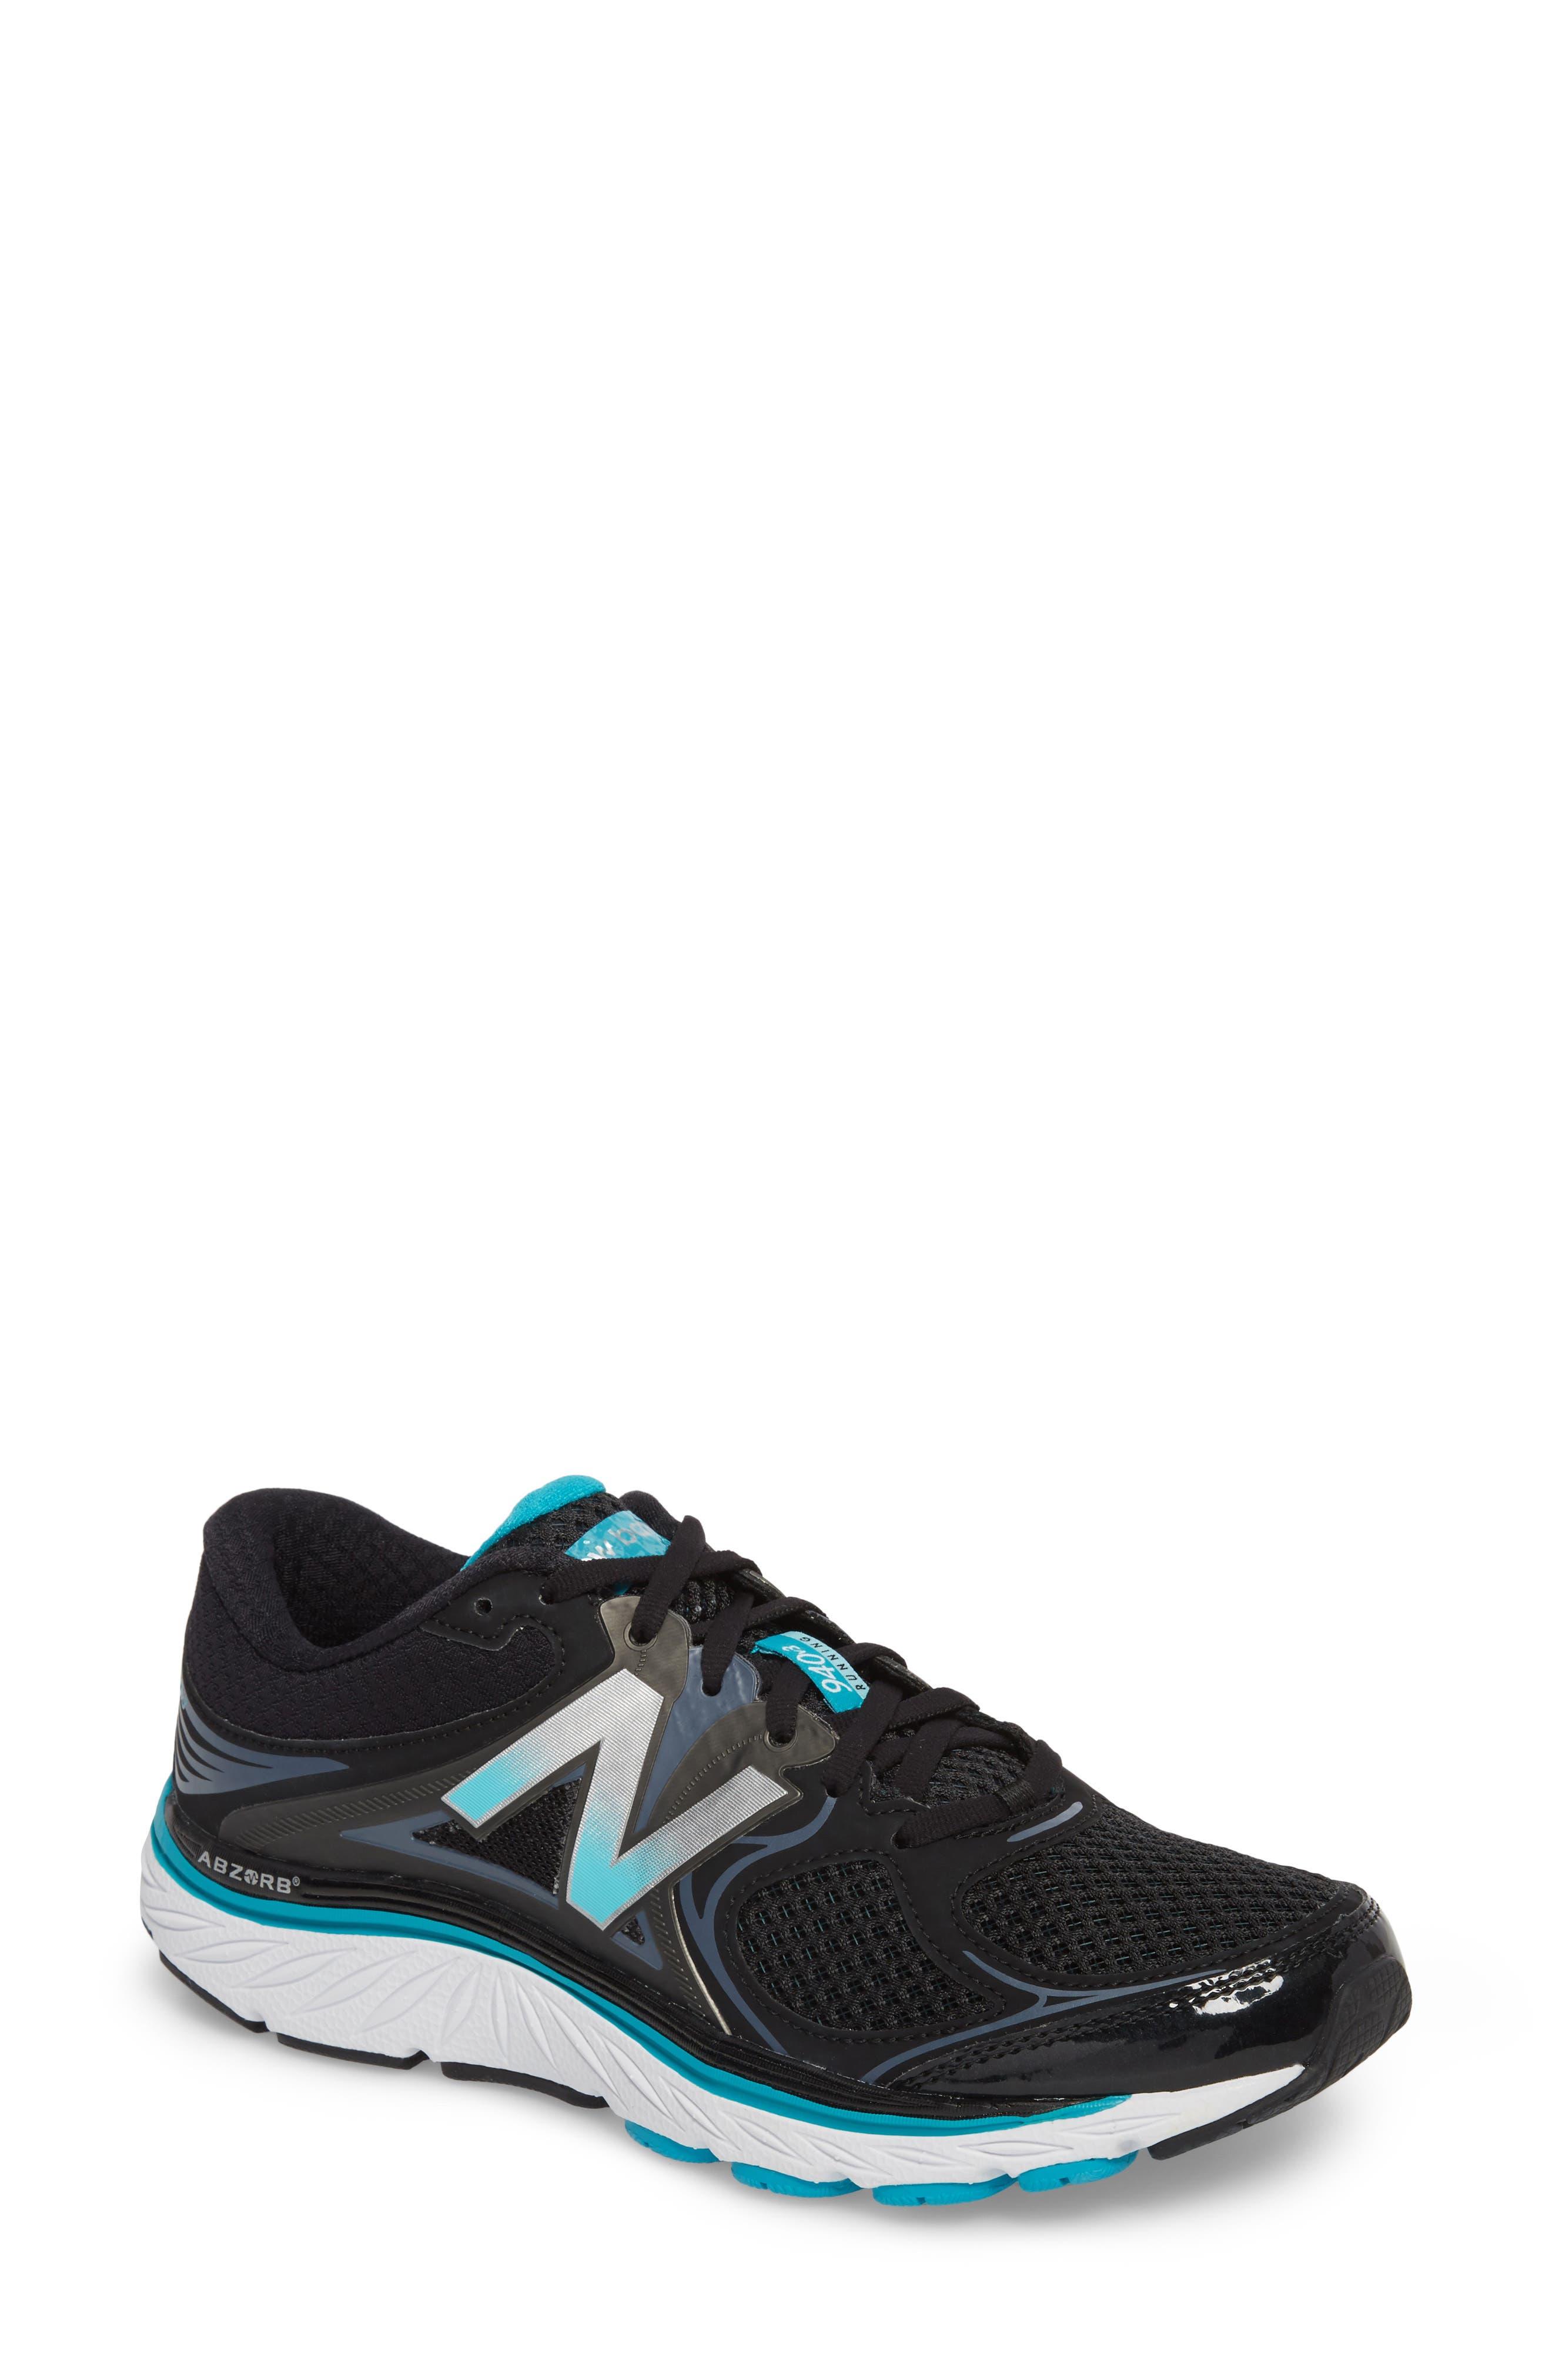 New Balance 940V3 Running Shoe B - Black